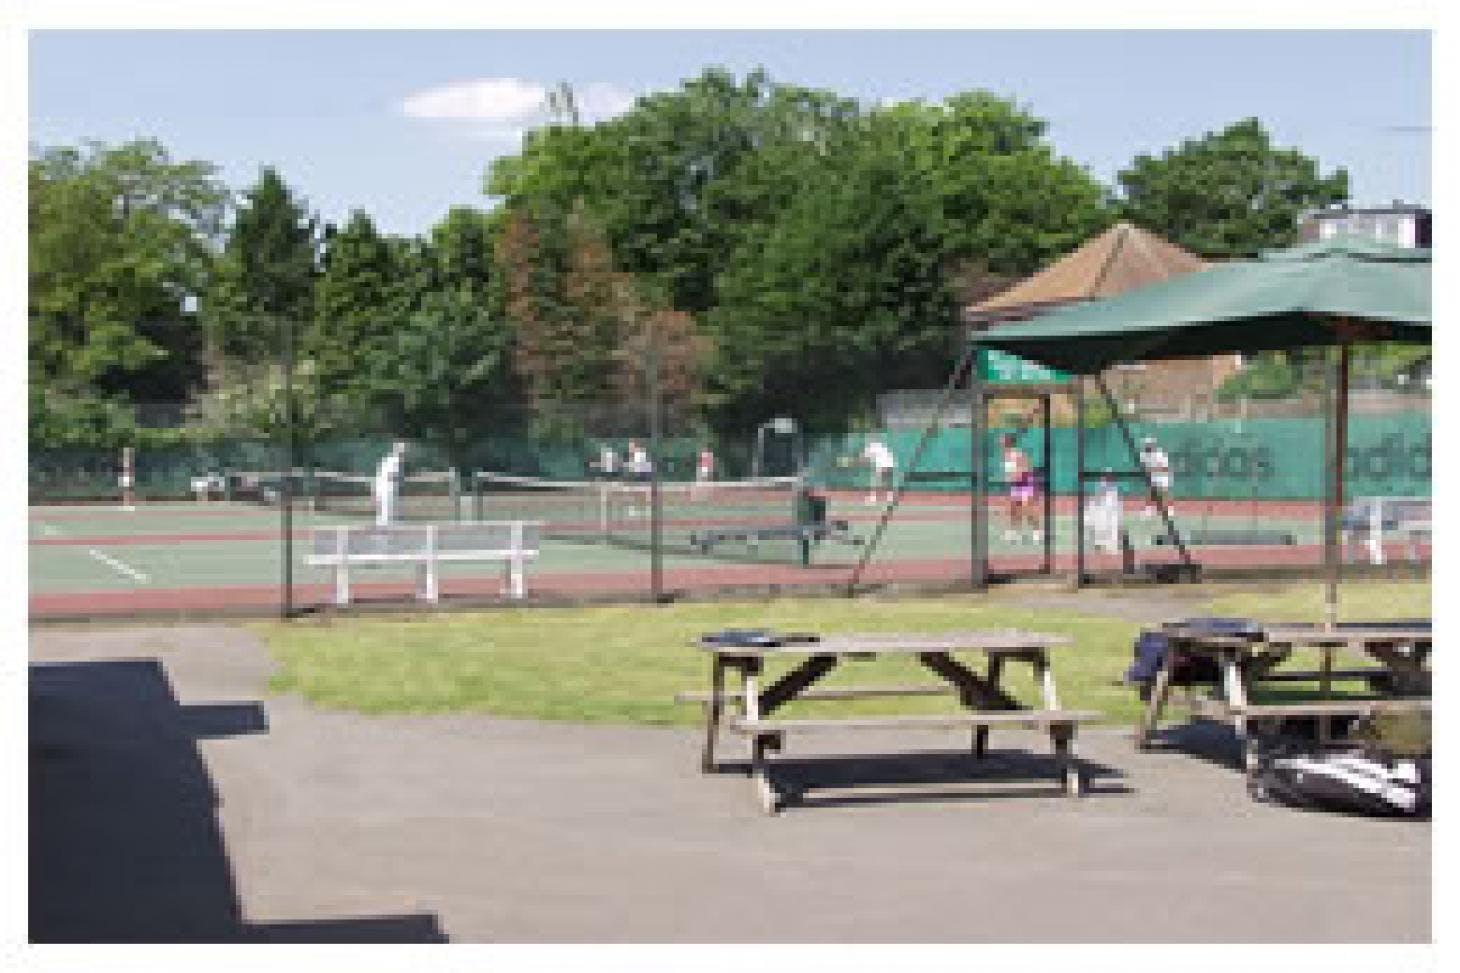 Sheen Lawn Tennis & Squash Club Indoor | Hard squash court